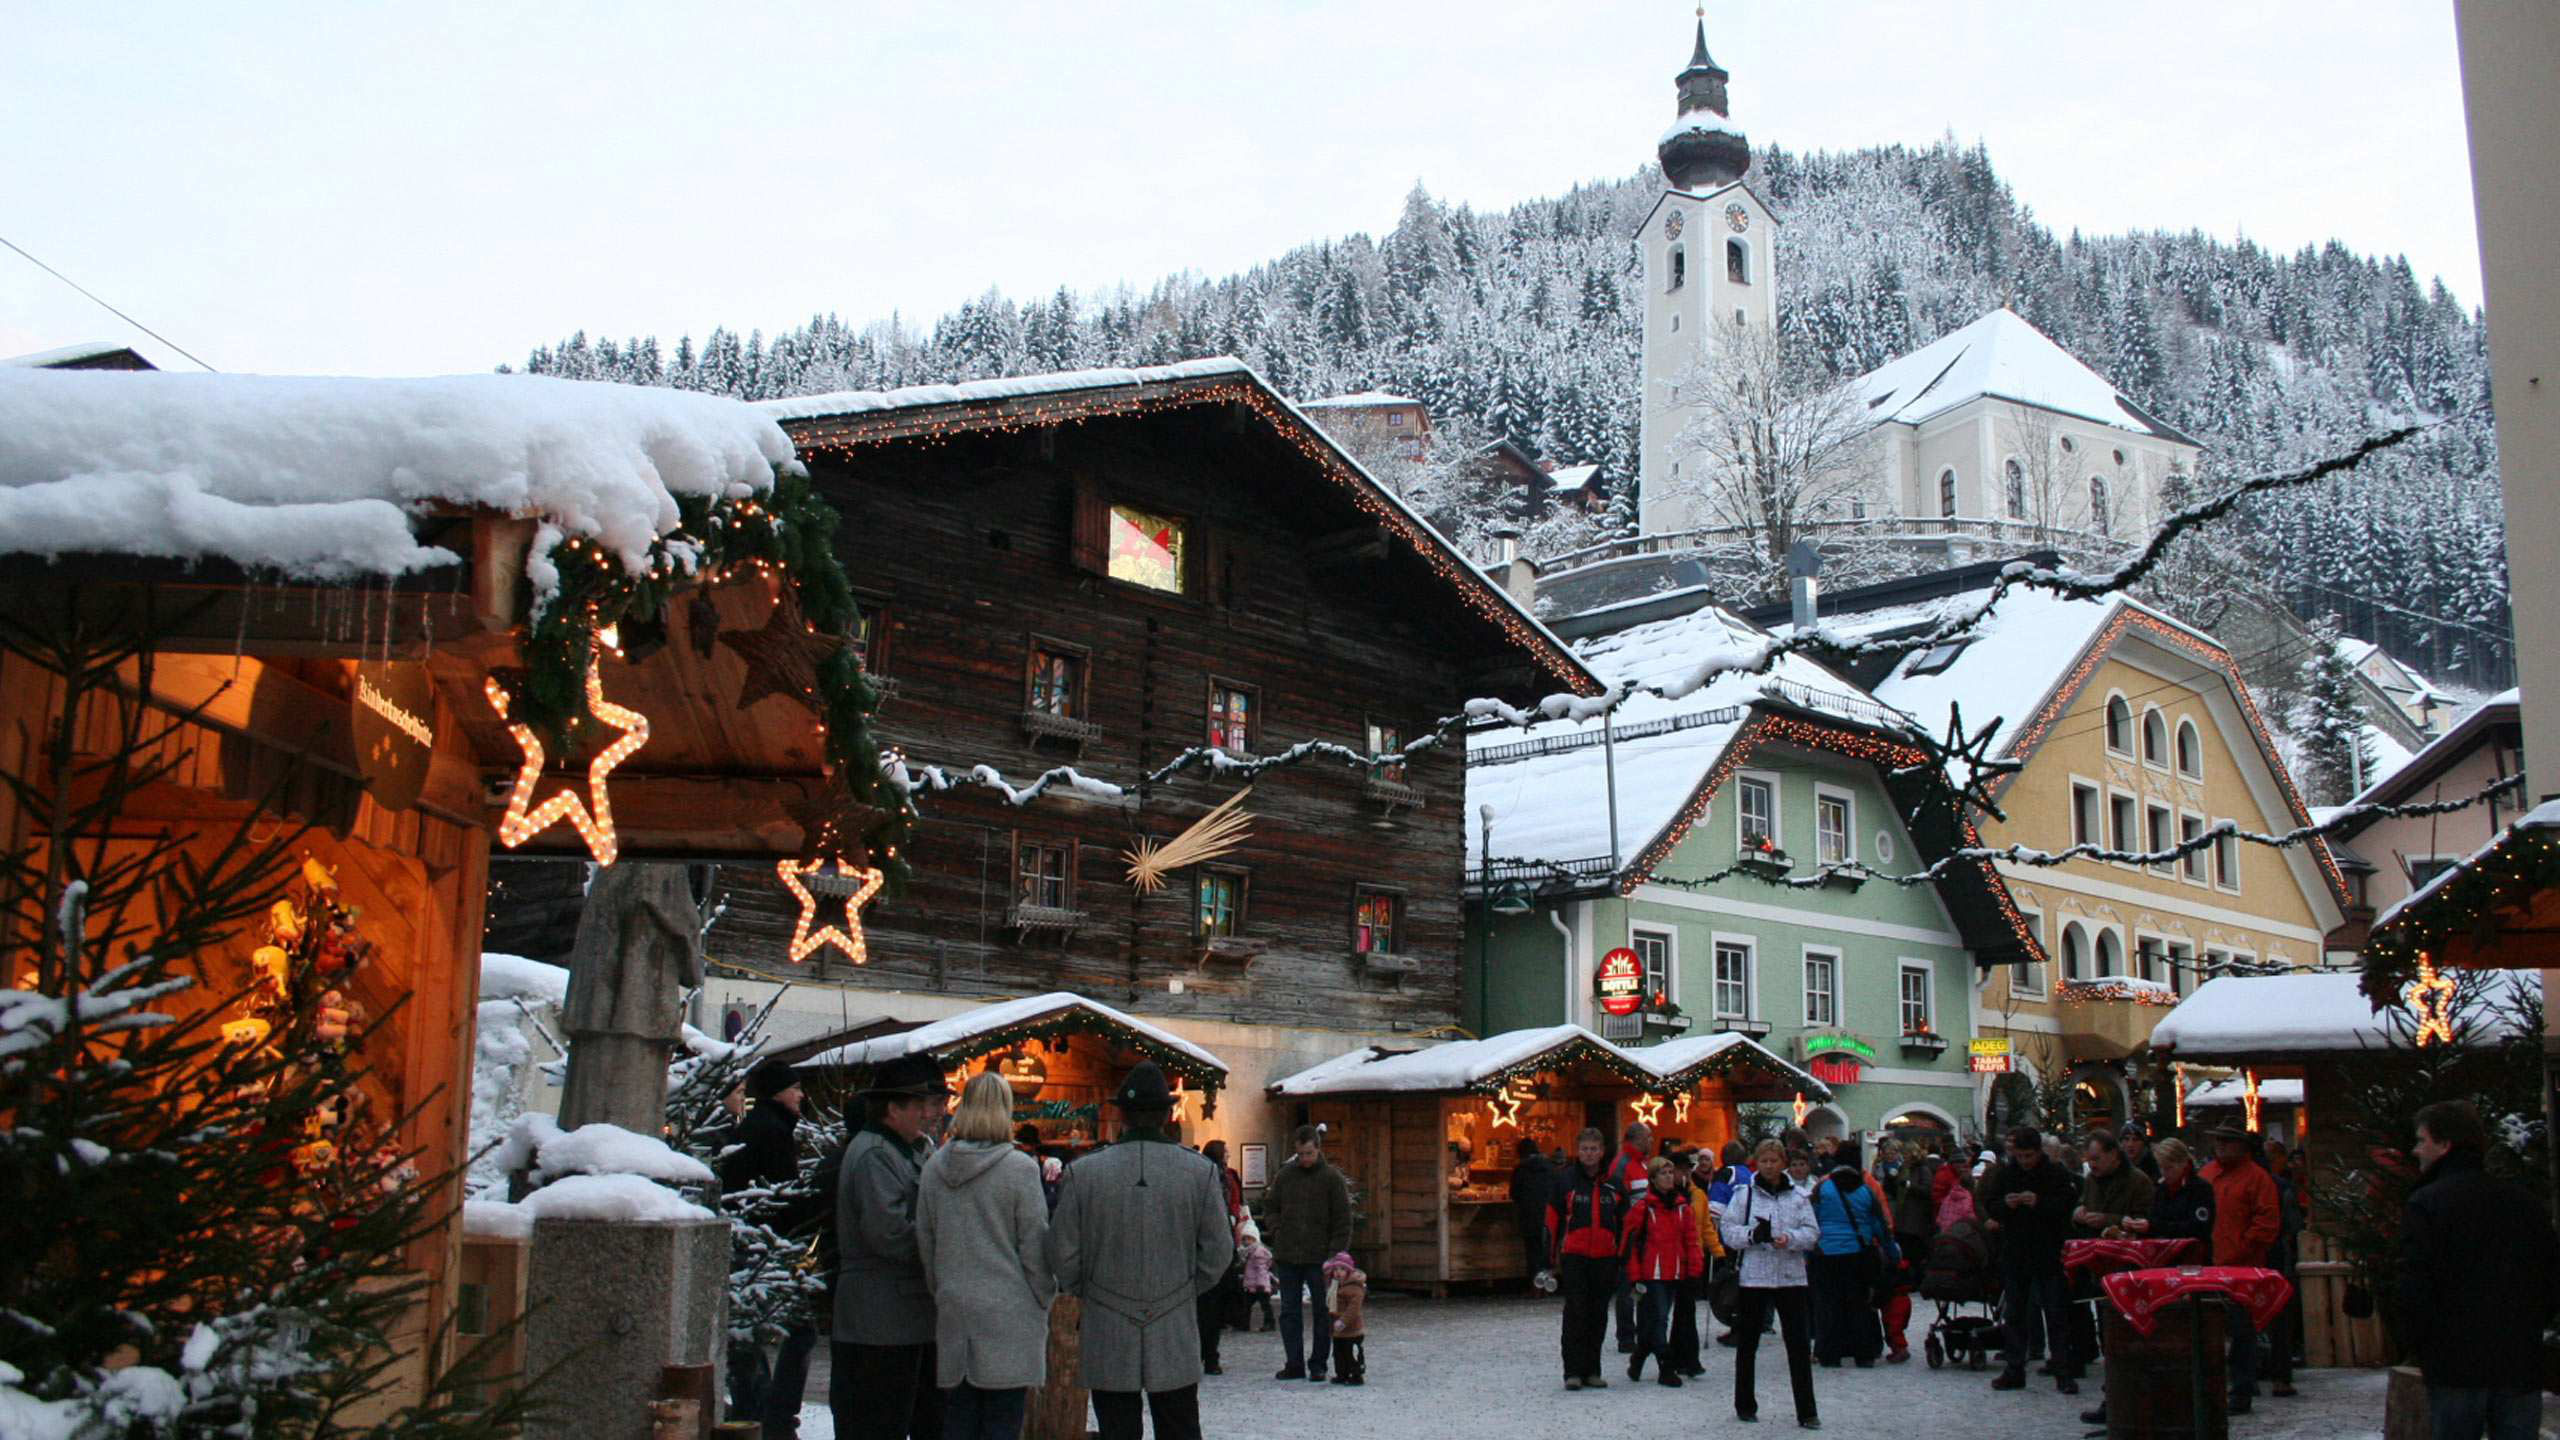 Sterne Hotels In Salzburg